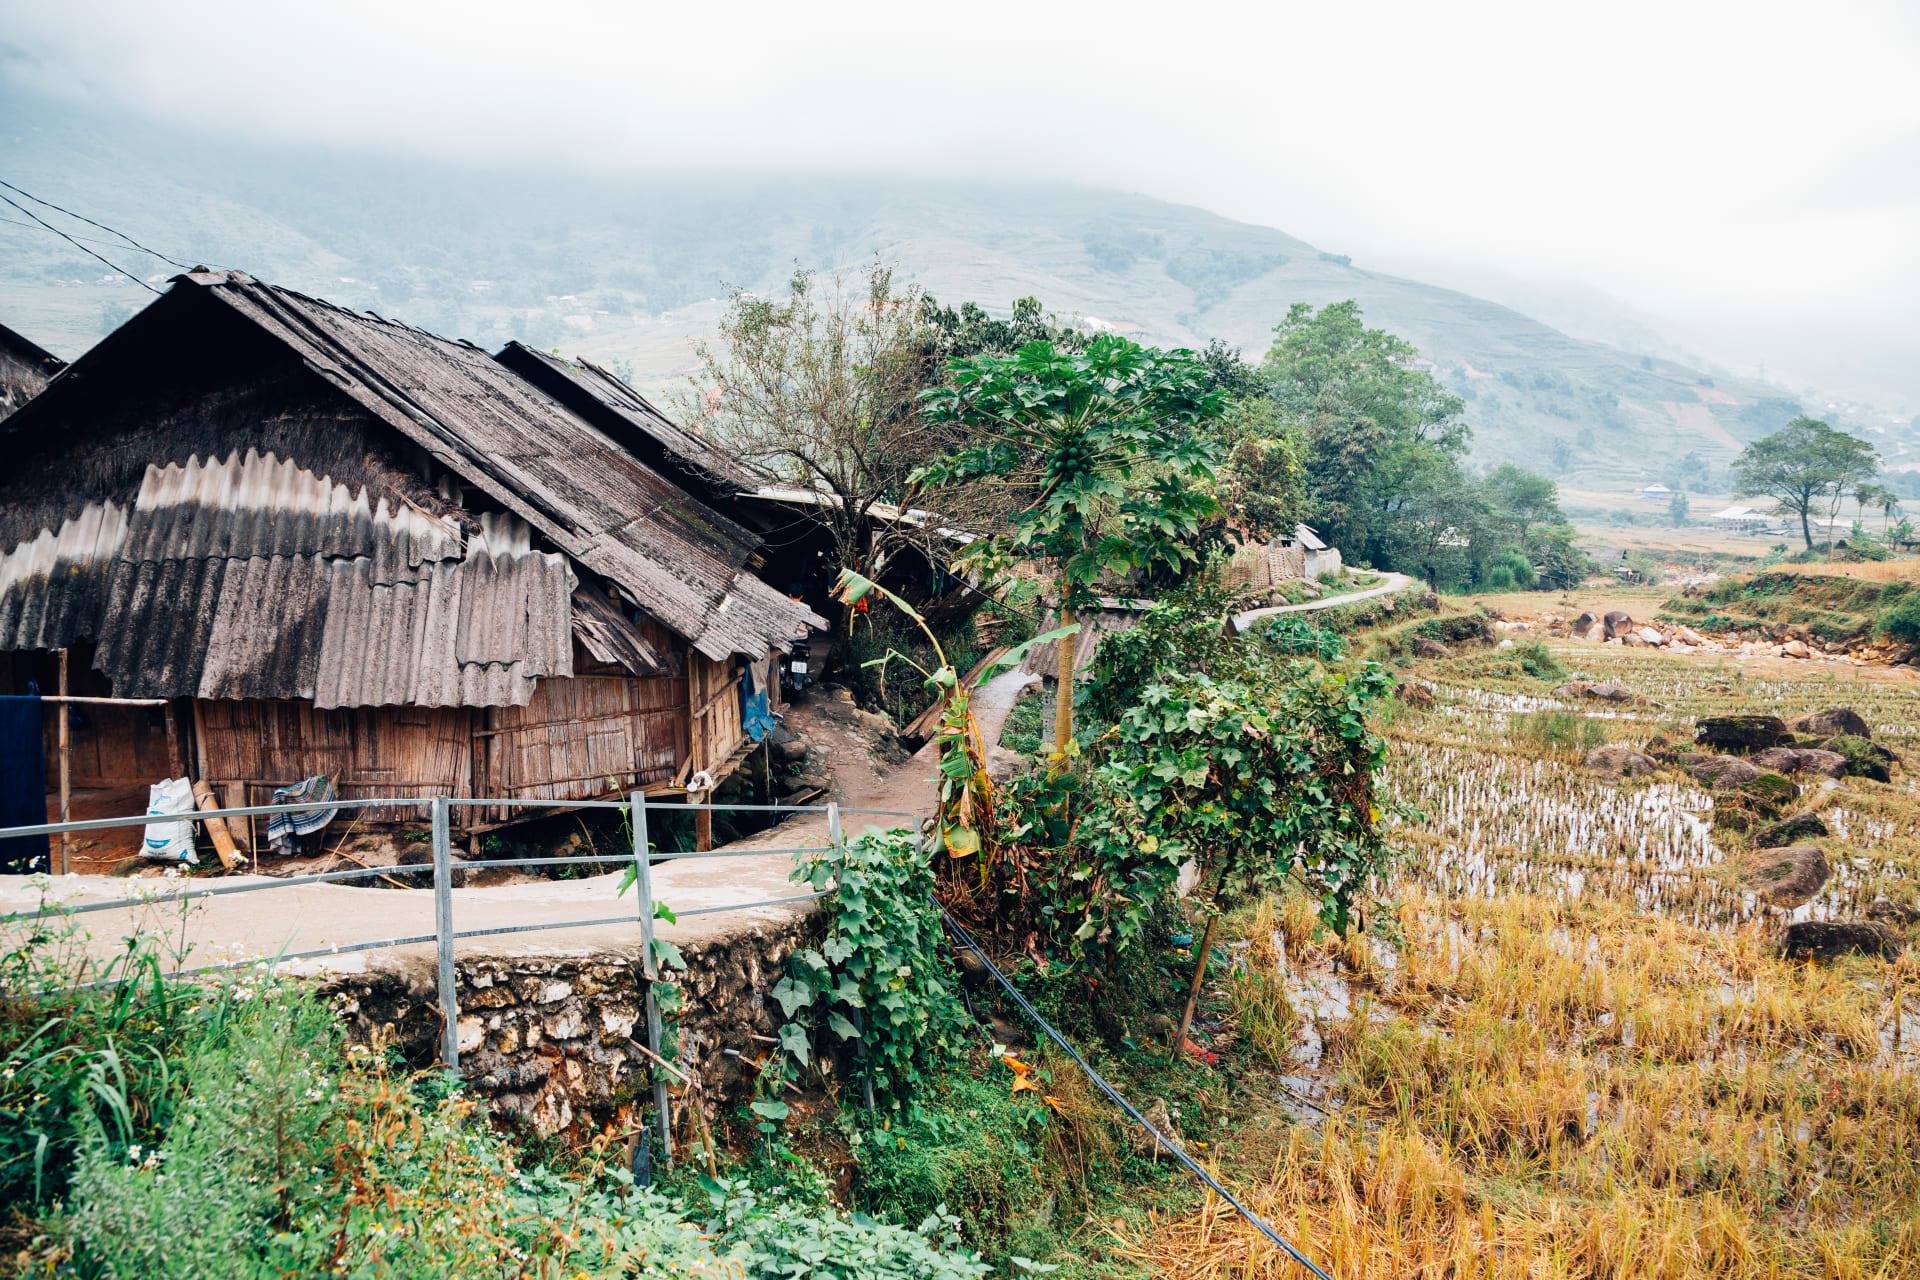 Hue - Hidden Huế - Day 1: Beautiful Village Life